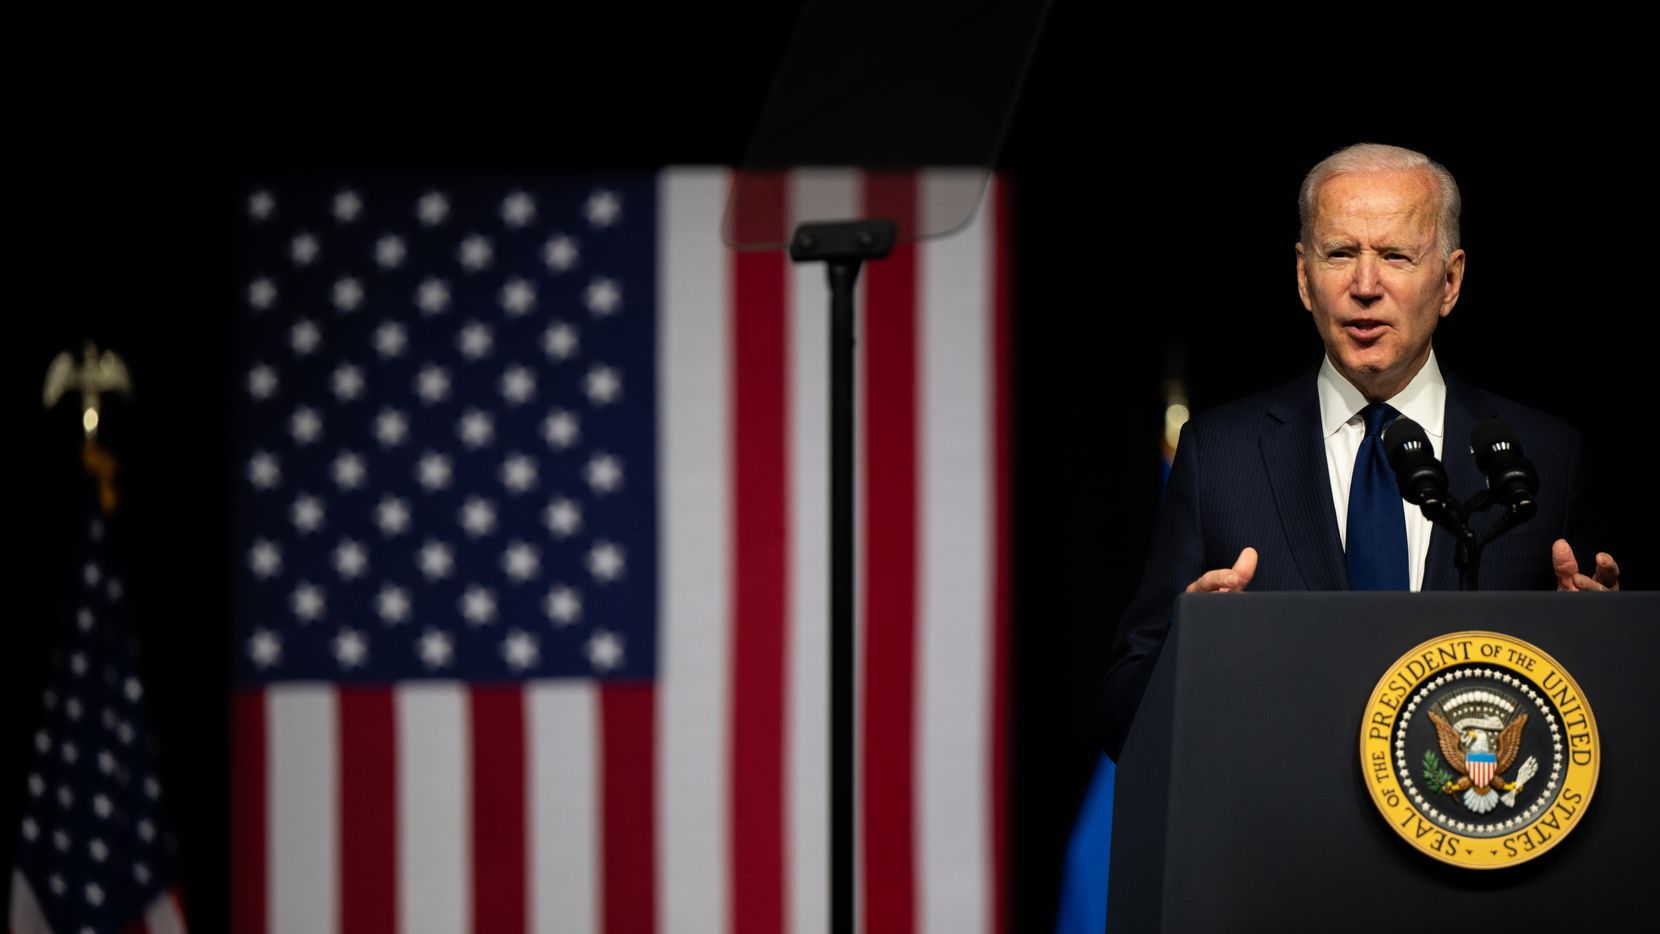 President Joe Biden speaks at an event to commemorate the 100th anniversary of the Tulsa Race Massacre on June 1, 2021 in Tulsa, Okla.